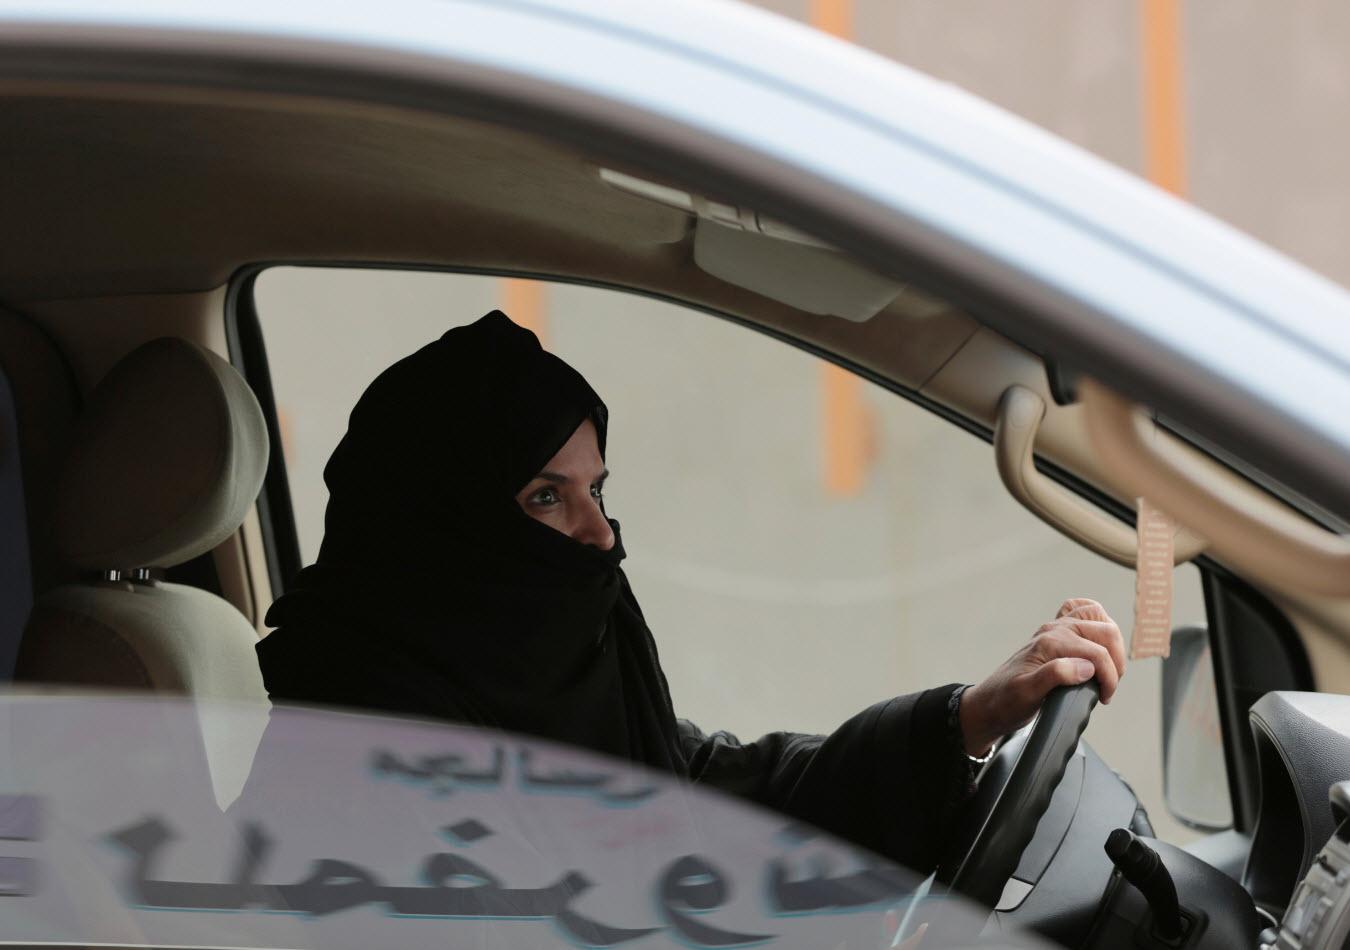 Aziza al-Yousef drives a car on a highway in Riyadh, Saudi Arabia in 2014.